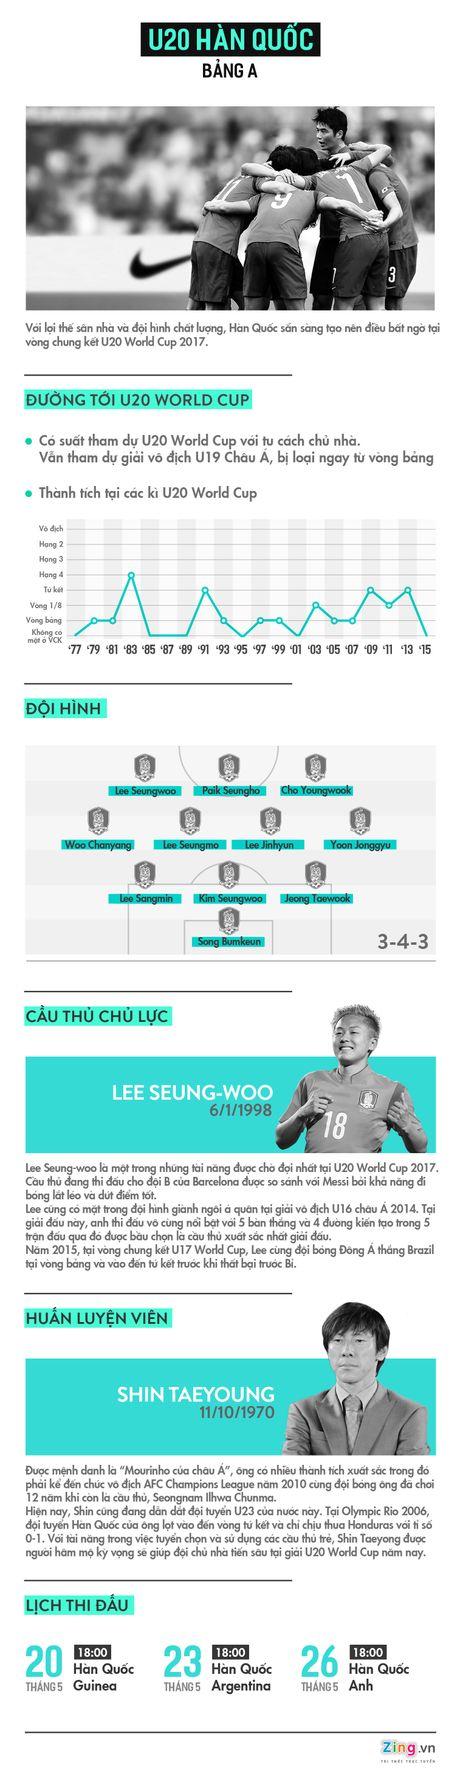 U20 Han Quoc: Chu nha va khat vong cua 'Mourinho chau A' - Anh 1